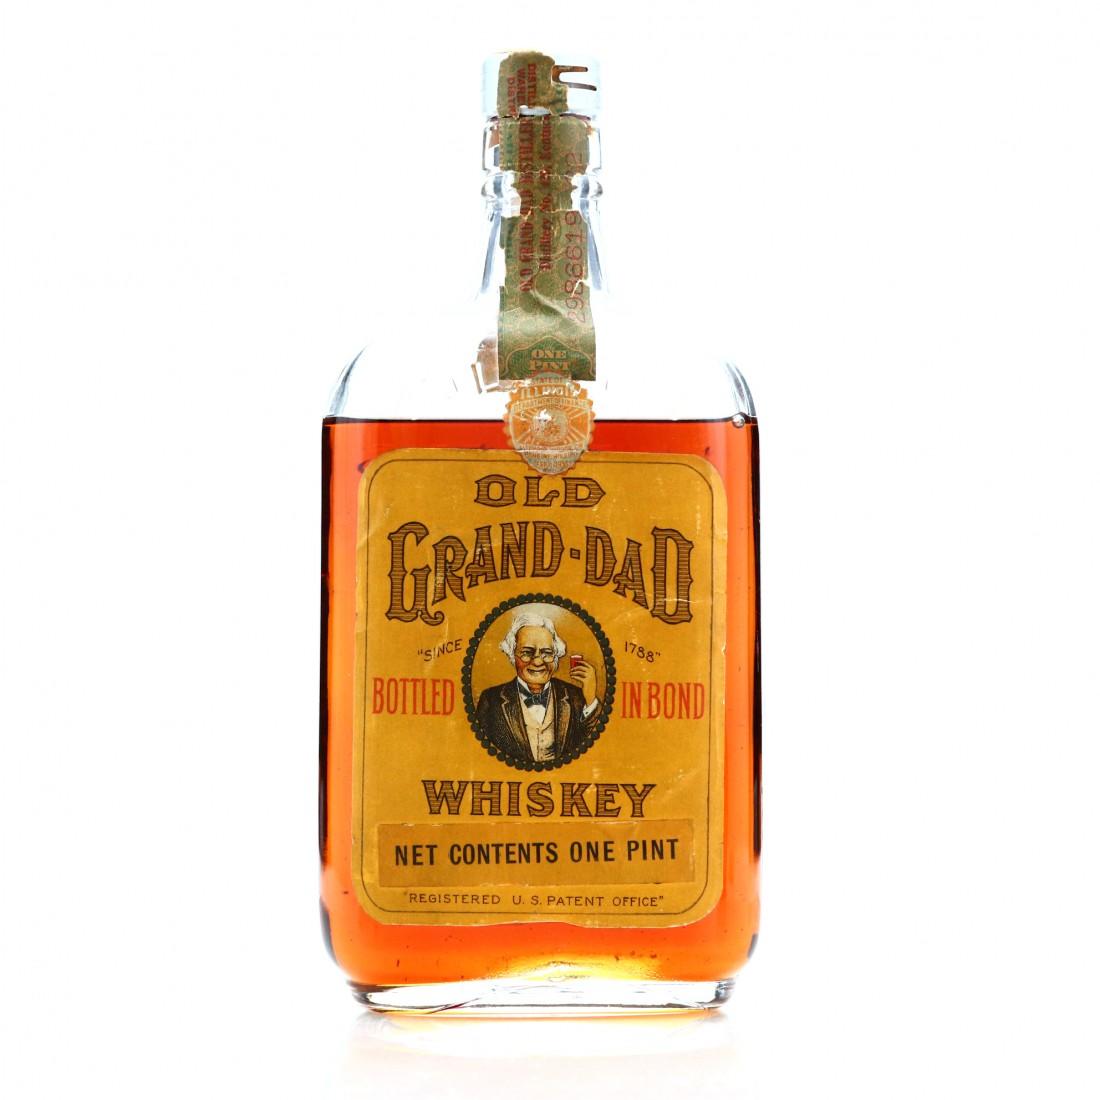 Old Grand-Dad 1917 AMS Co Bottled in Bond Whiskey Pint / Prohibition Era Bottling